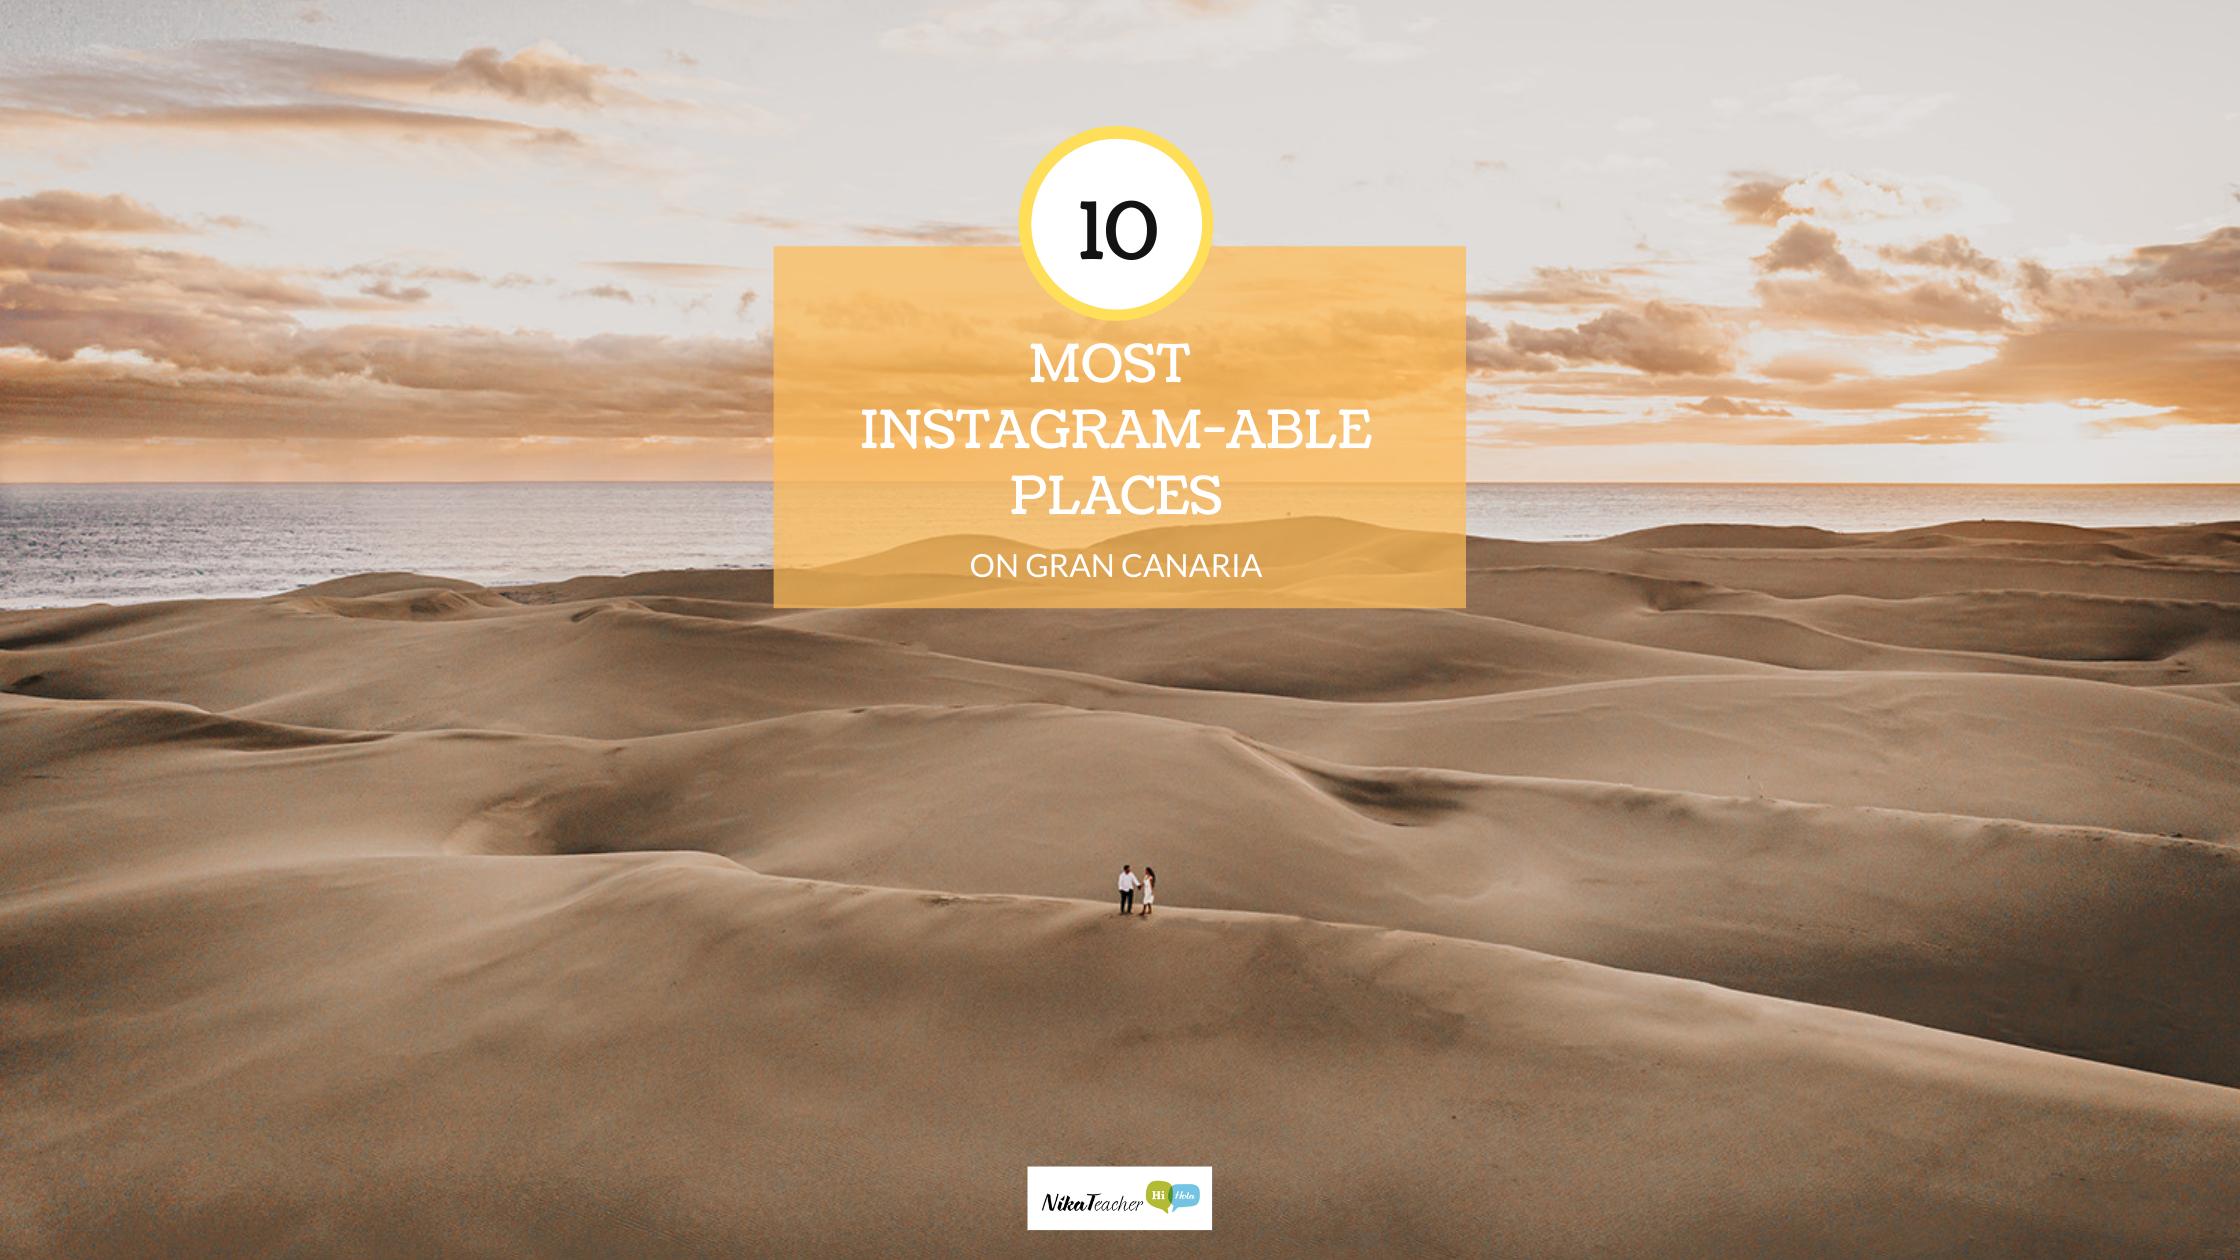 10 most instagram